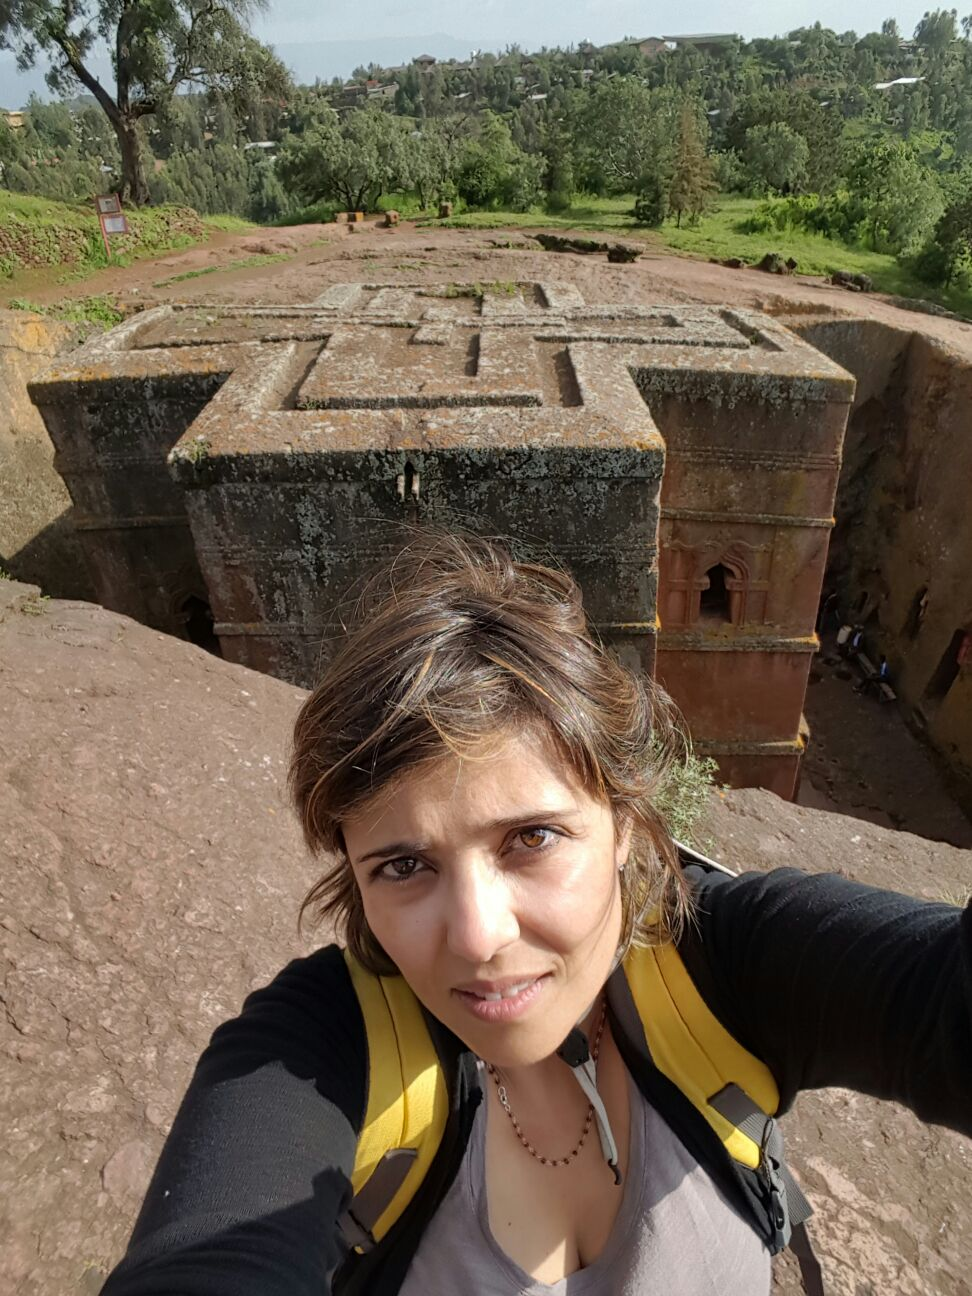 viajes a África con experto